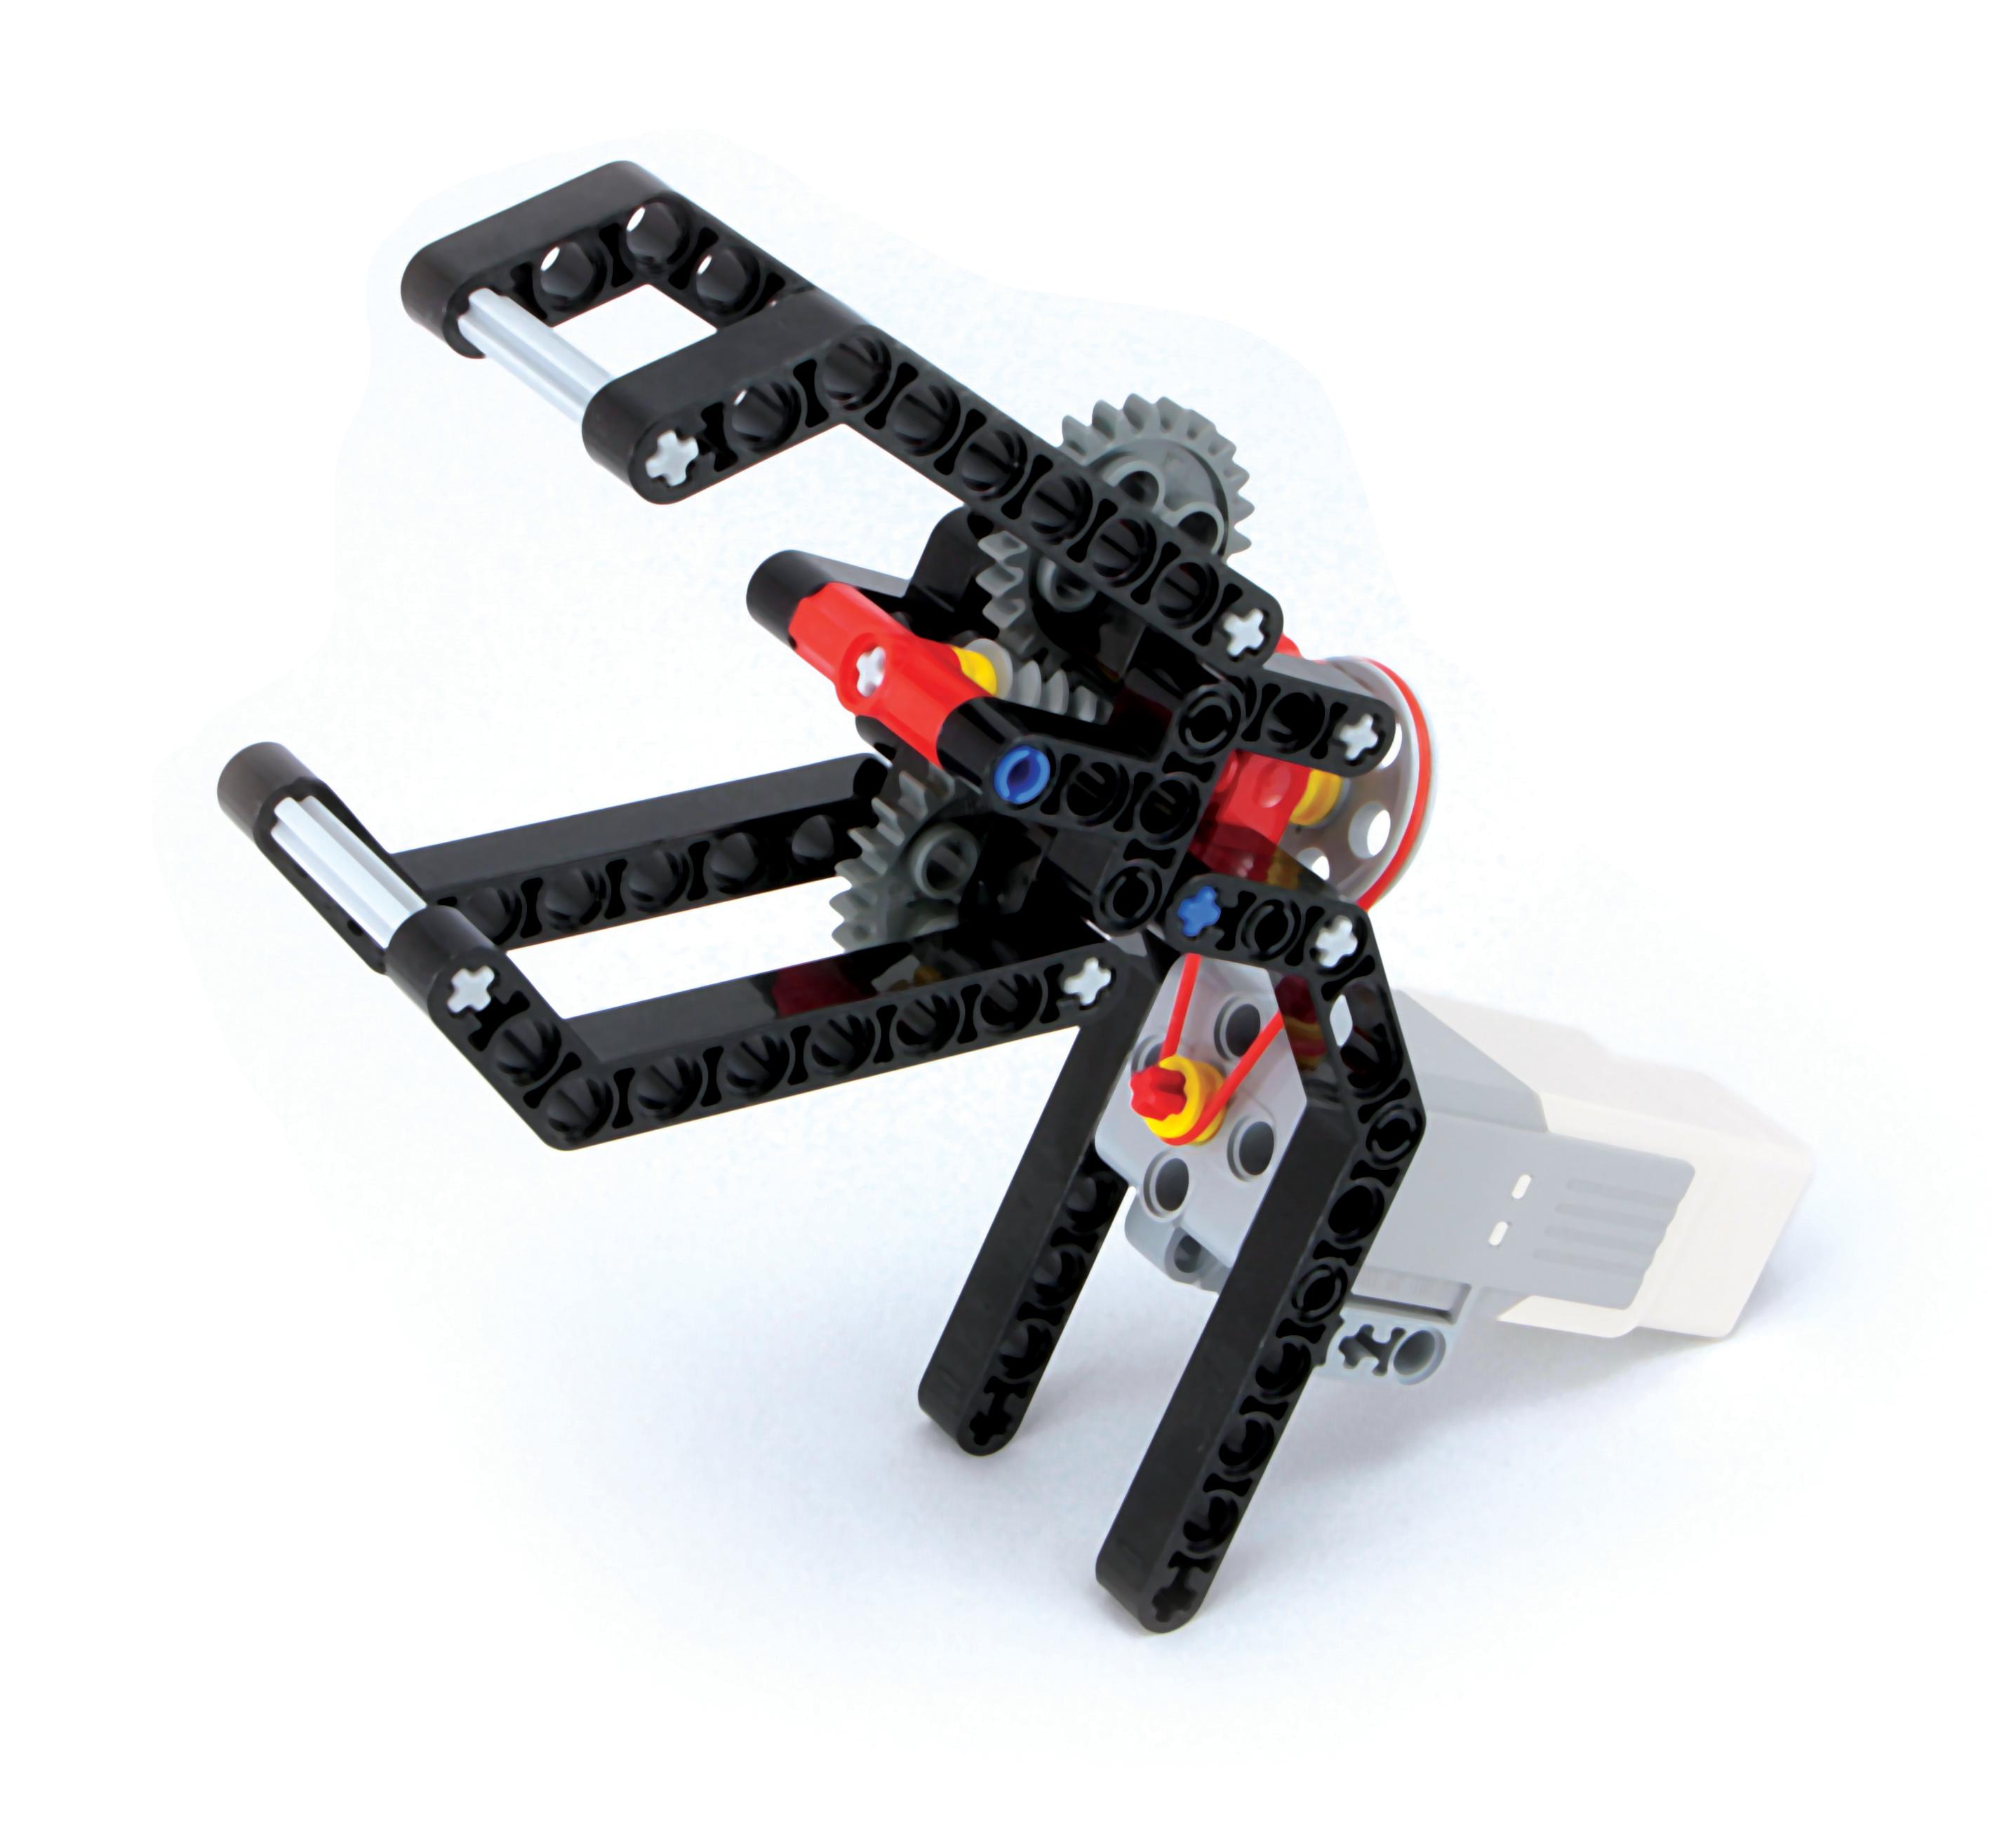 Lego Mindstorms Gear Build